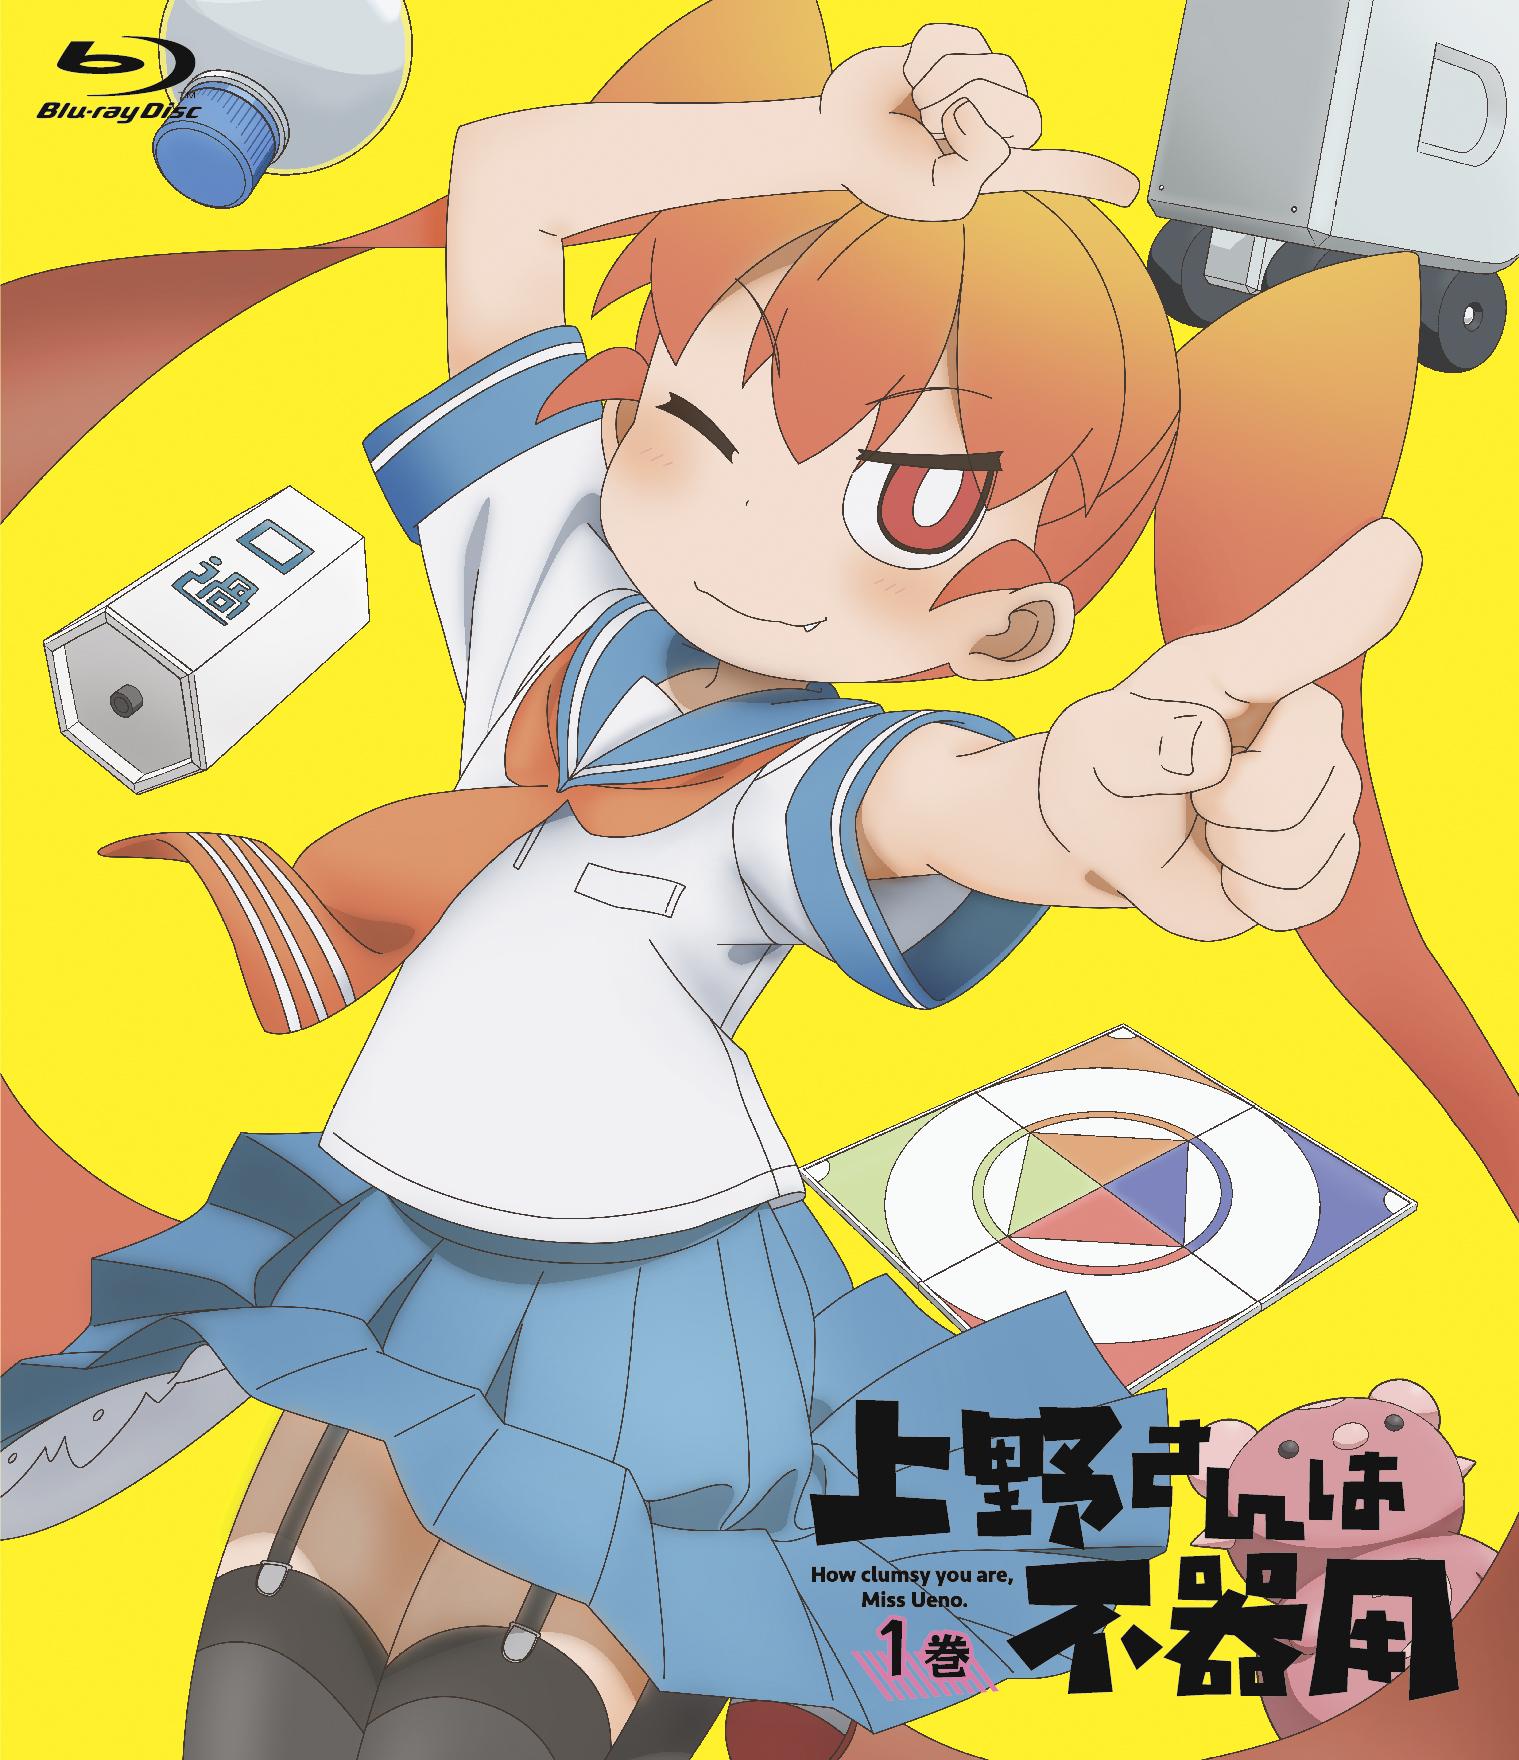 SMIB039_上野さんは不器用 1巻(Blu-ray)